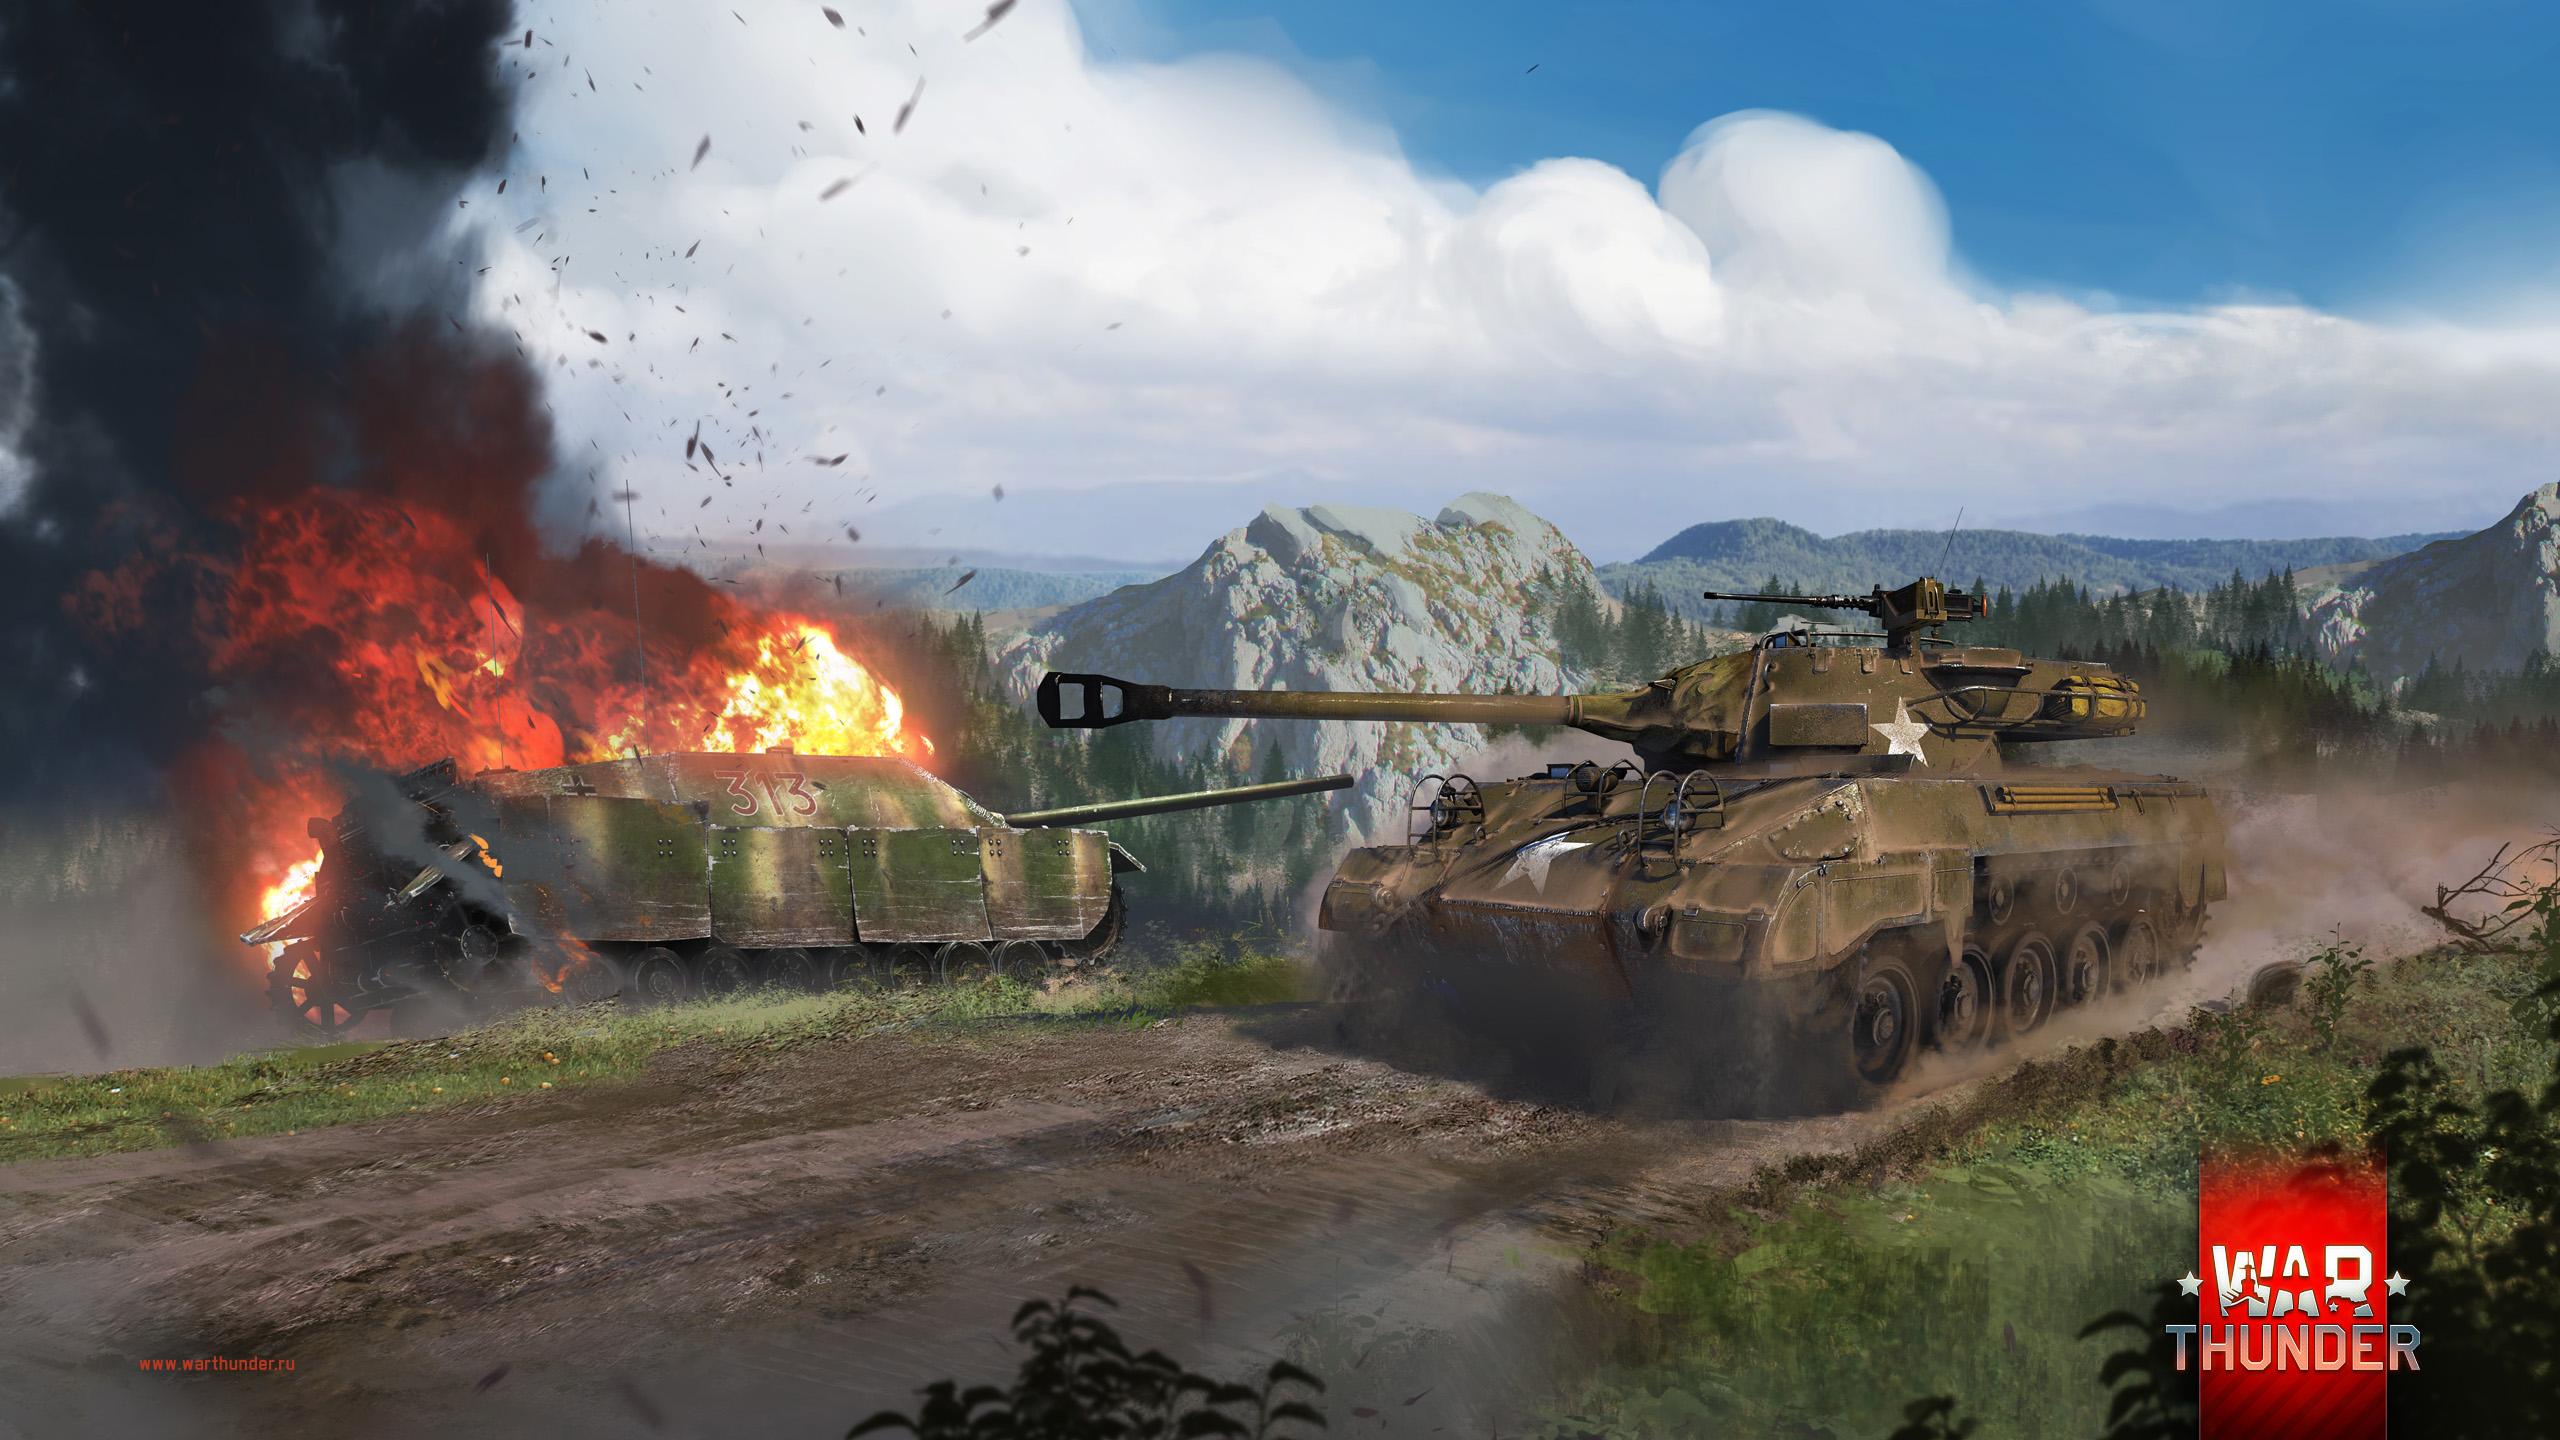 рисунок M18 vs Jagdpanzer IV